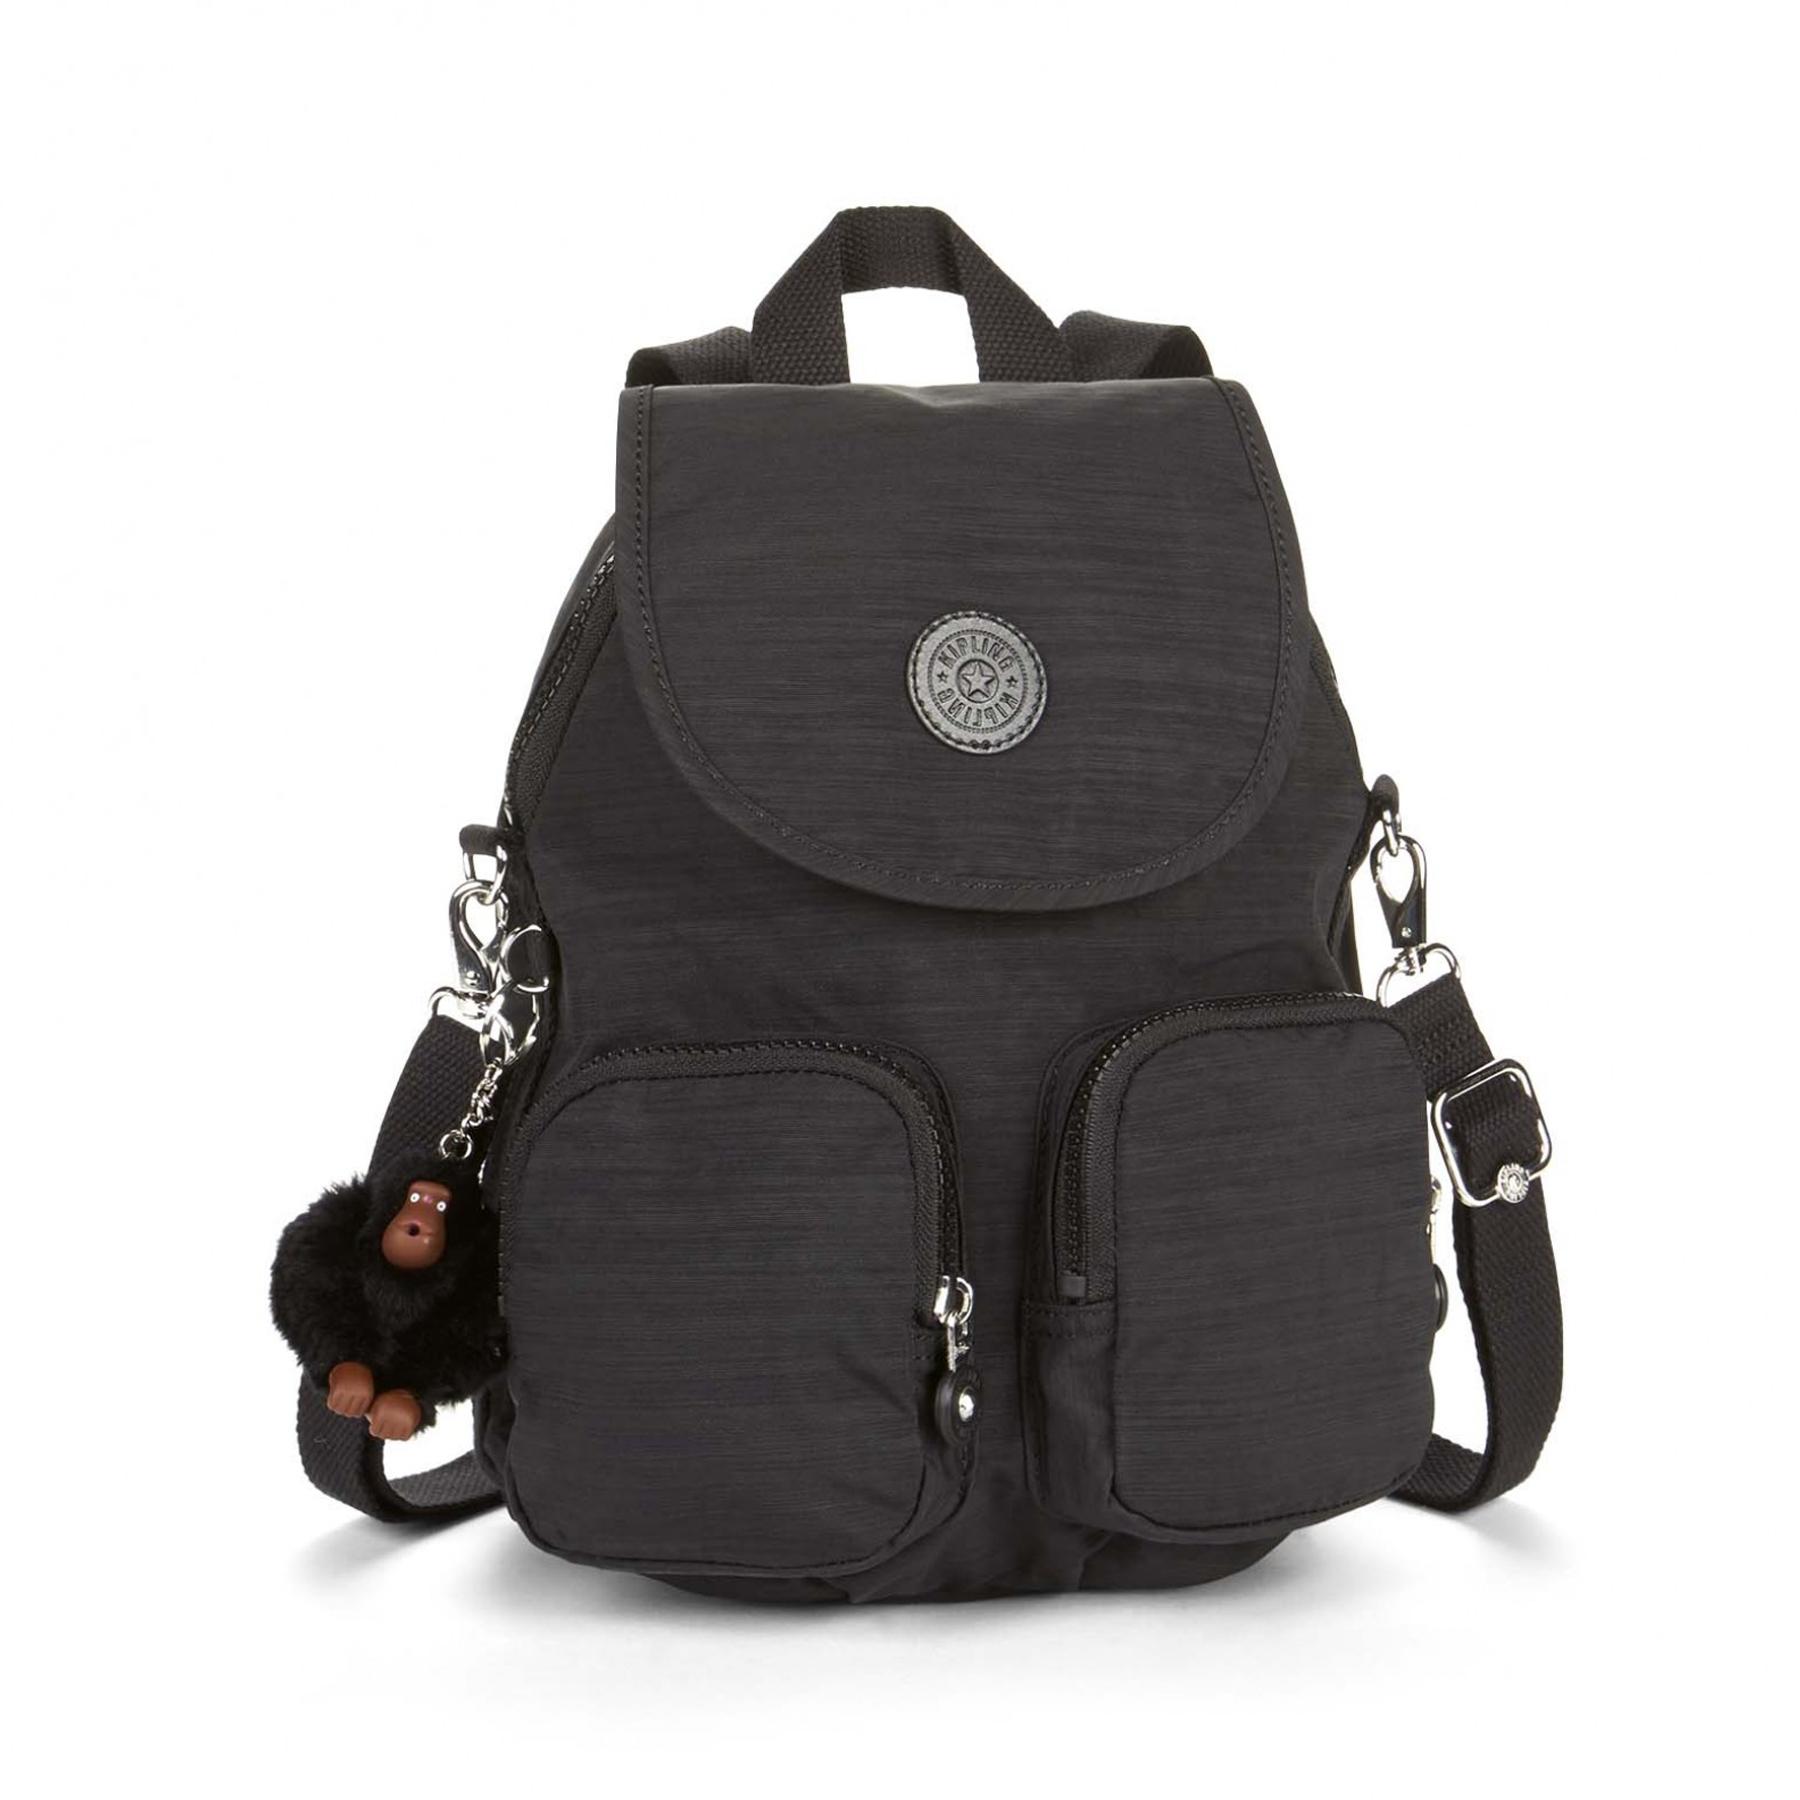 K23512H53 5938f608fd561f1008d05f40 19571416. kipling firefly up backpack  dazz black backpacks   shoulder bags   jarrolds norwich . 3fd3e1ed6c